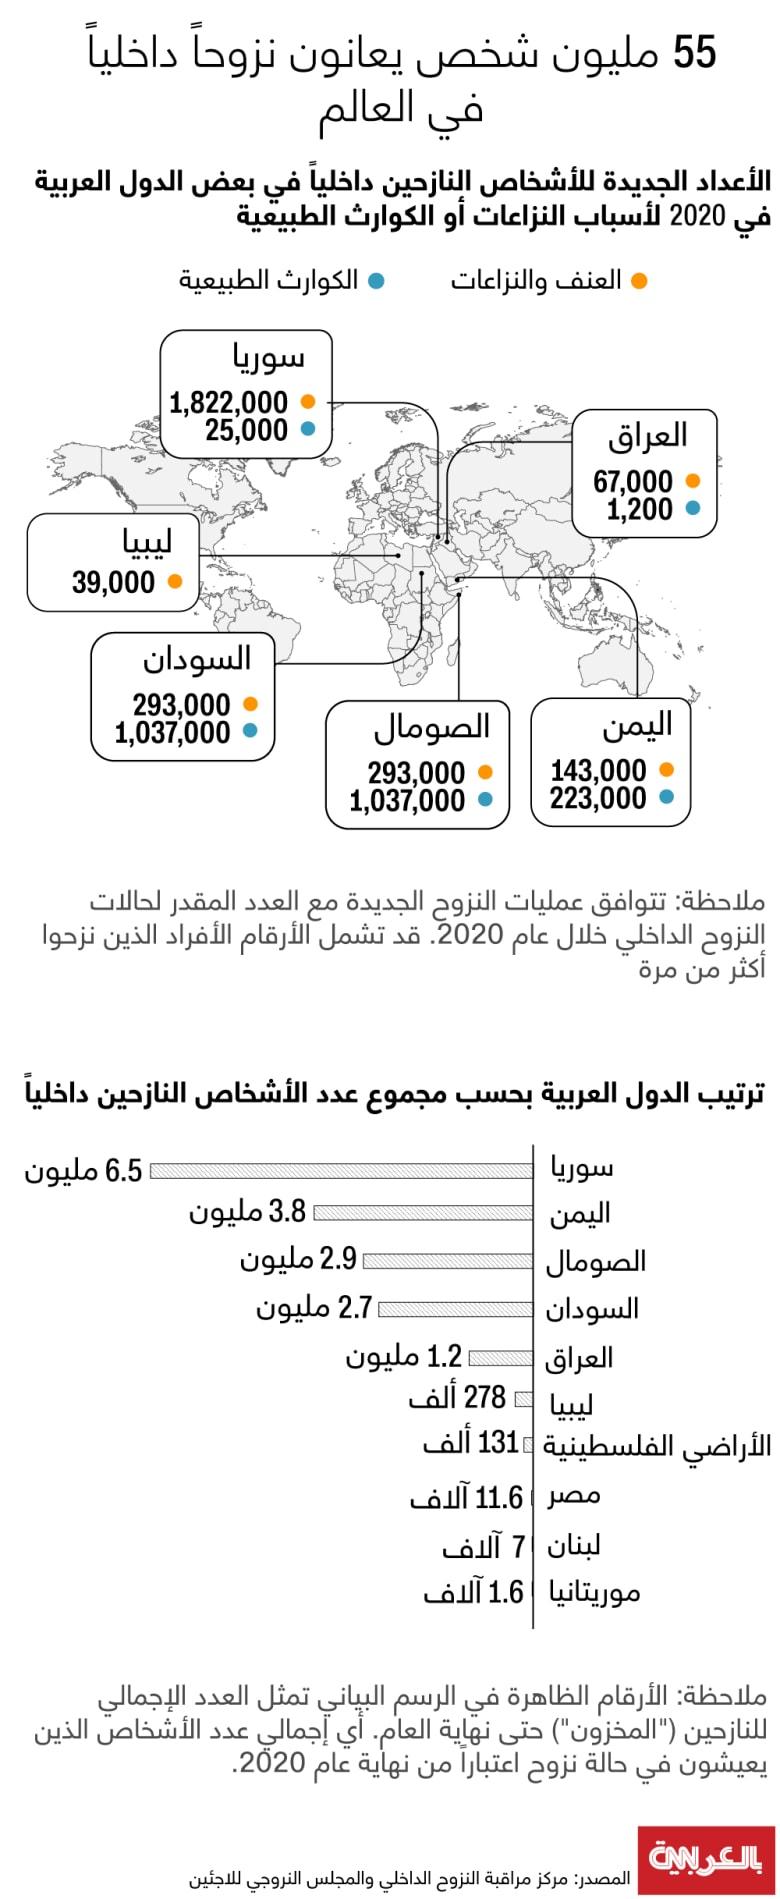 displaced-55M-2020-worldwide